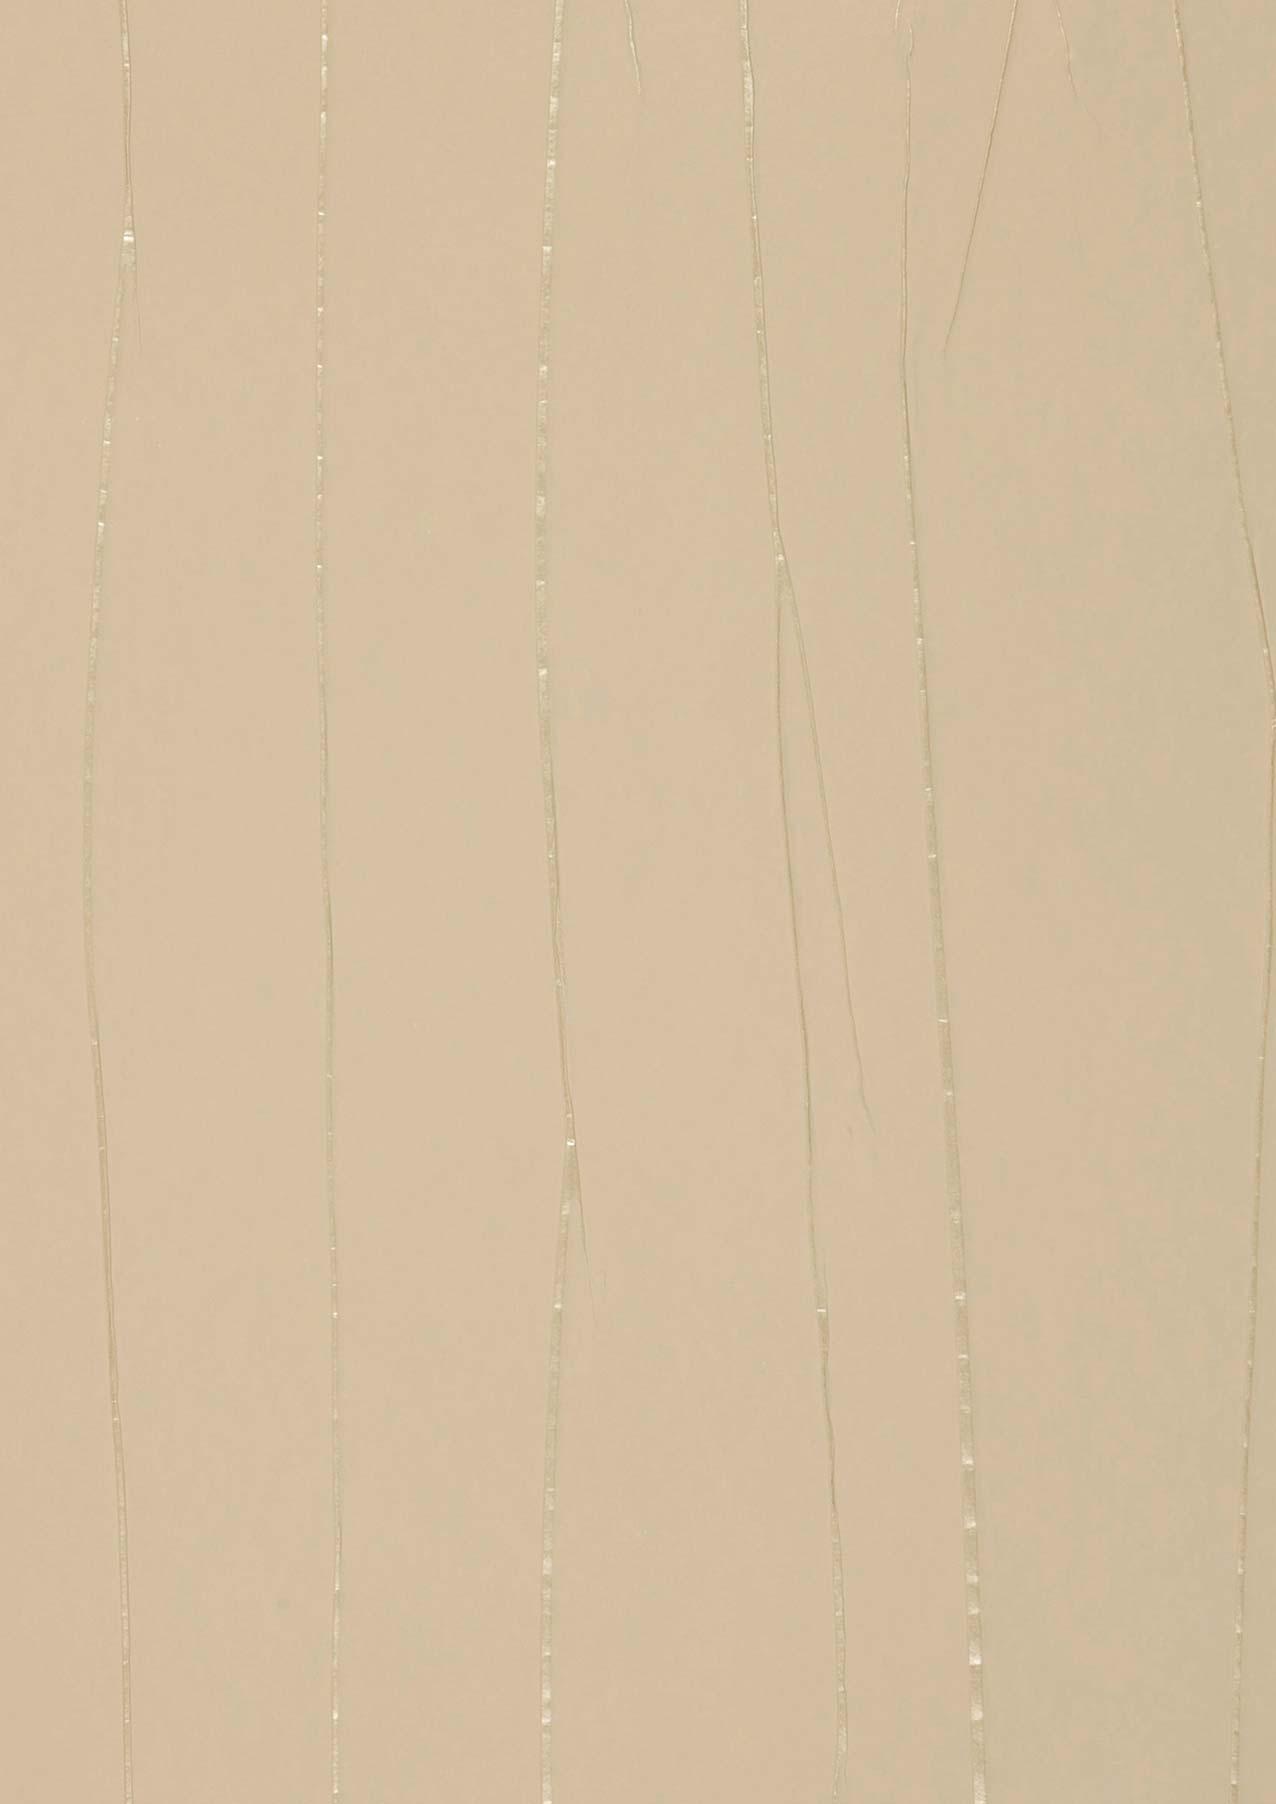 tapete crush luxor 01 elfenbein beige tapeten der 70er. Black Bedroom Furniture Sets. Home Design Ideas